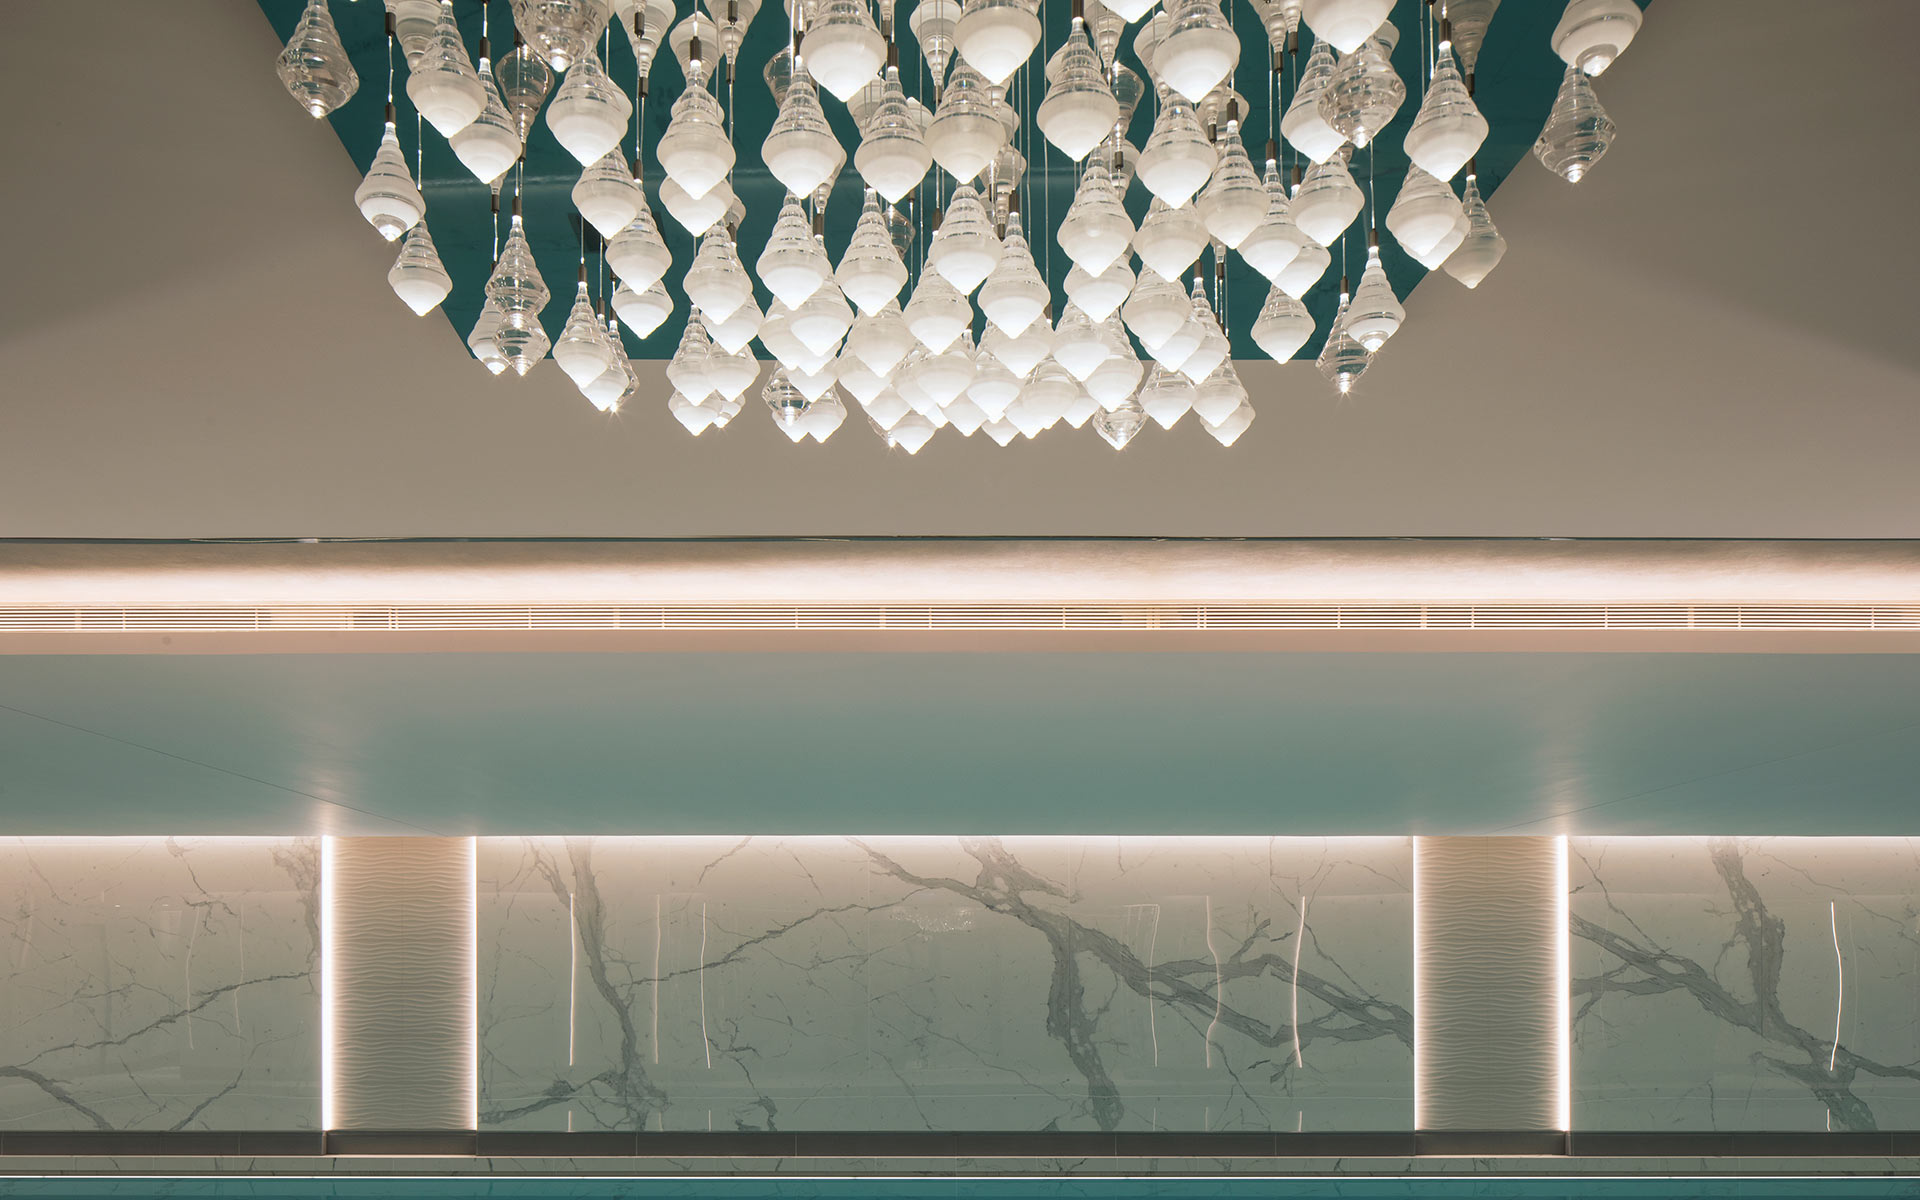 Striking Chandelier Suspended Droplets Cluster Reflective Ceiling Plate Luxury Spa Swimming Pool London Bespoke Lighting Designers Nulty Bespoke